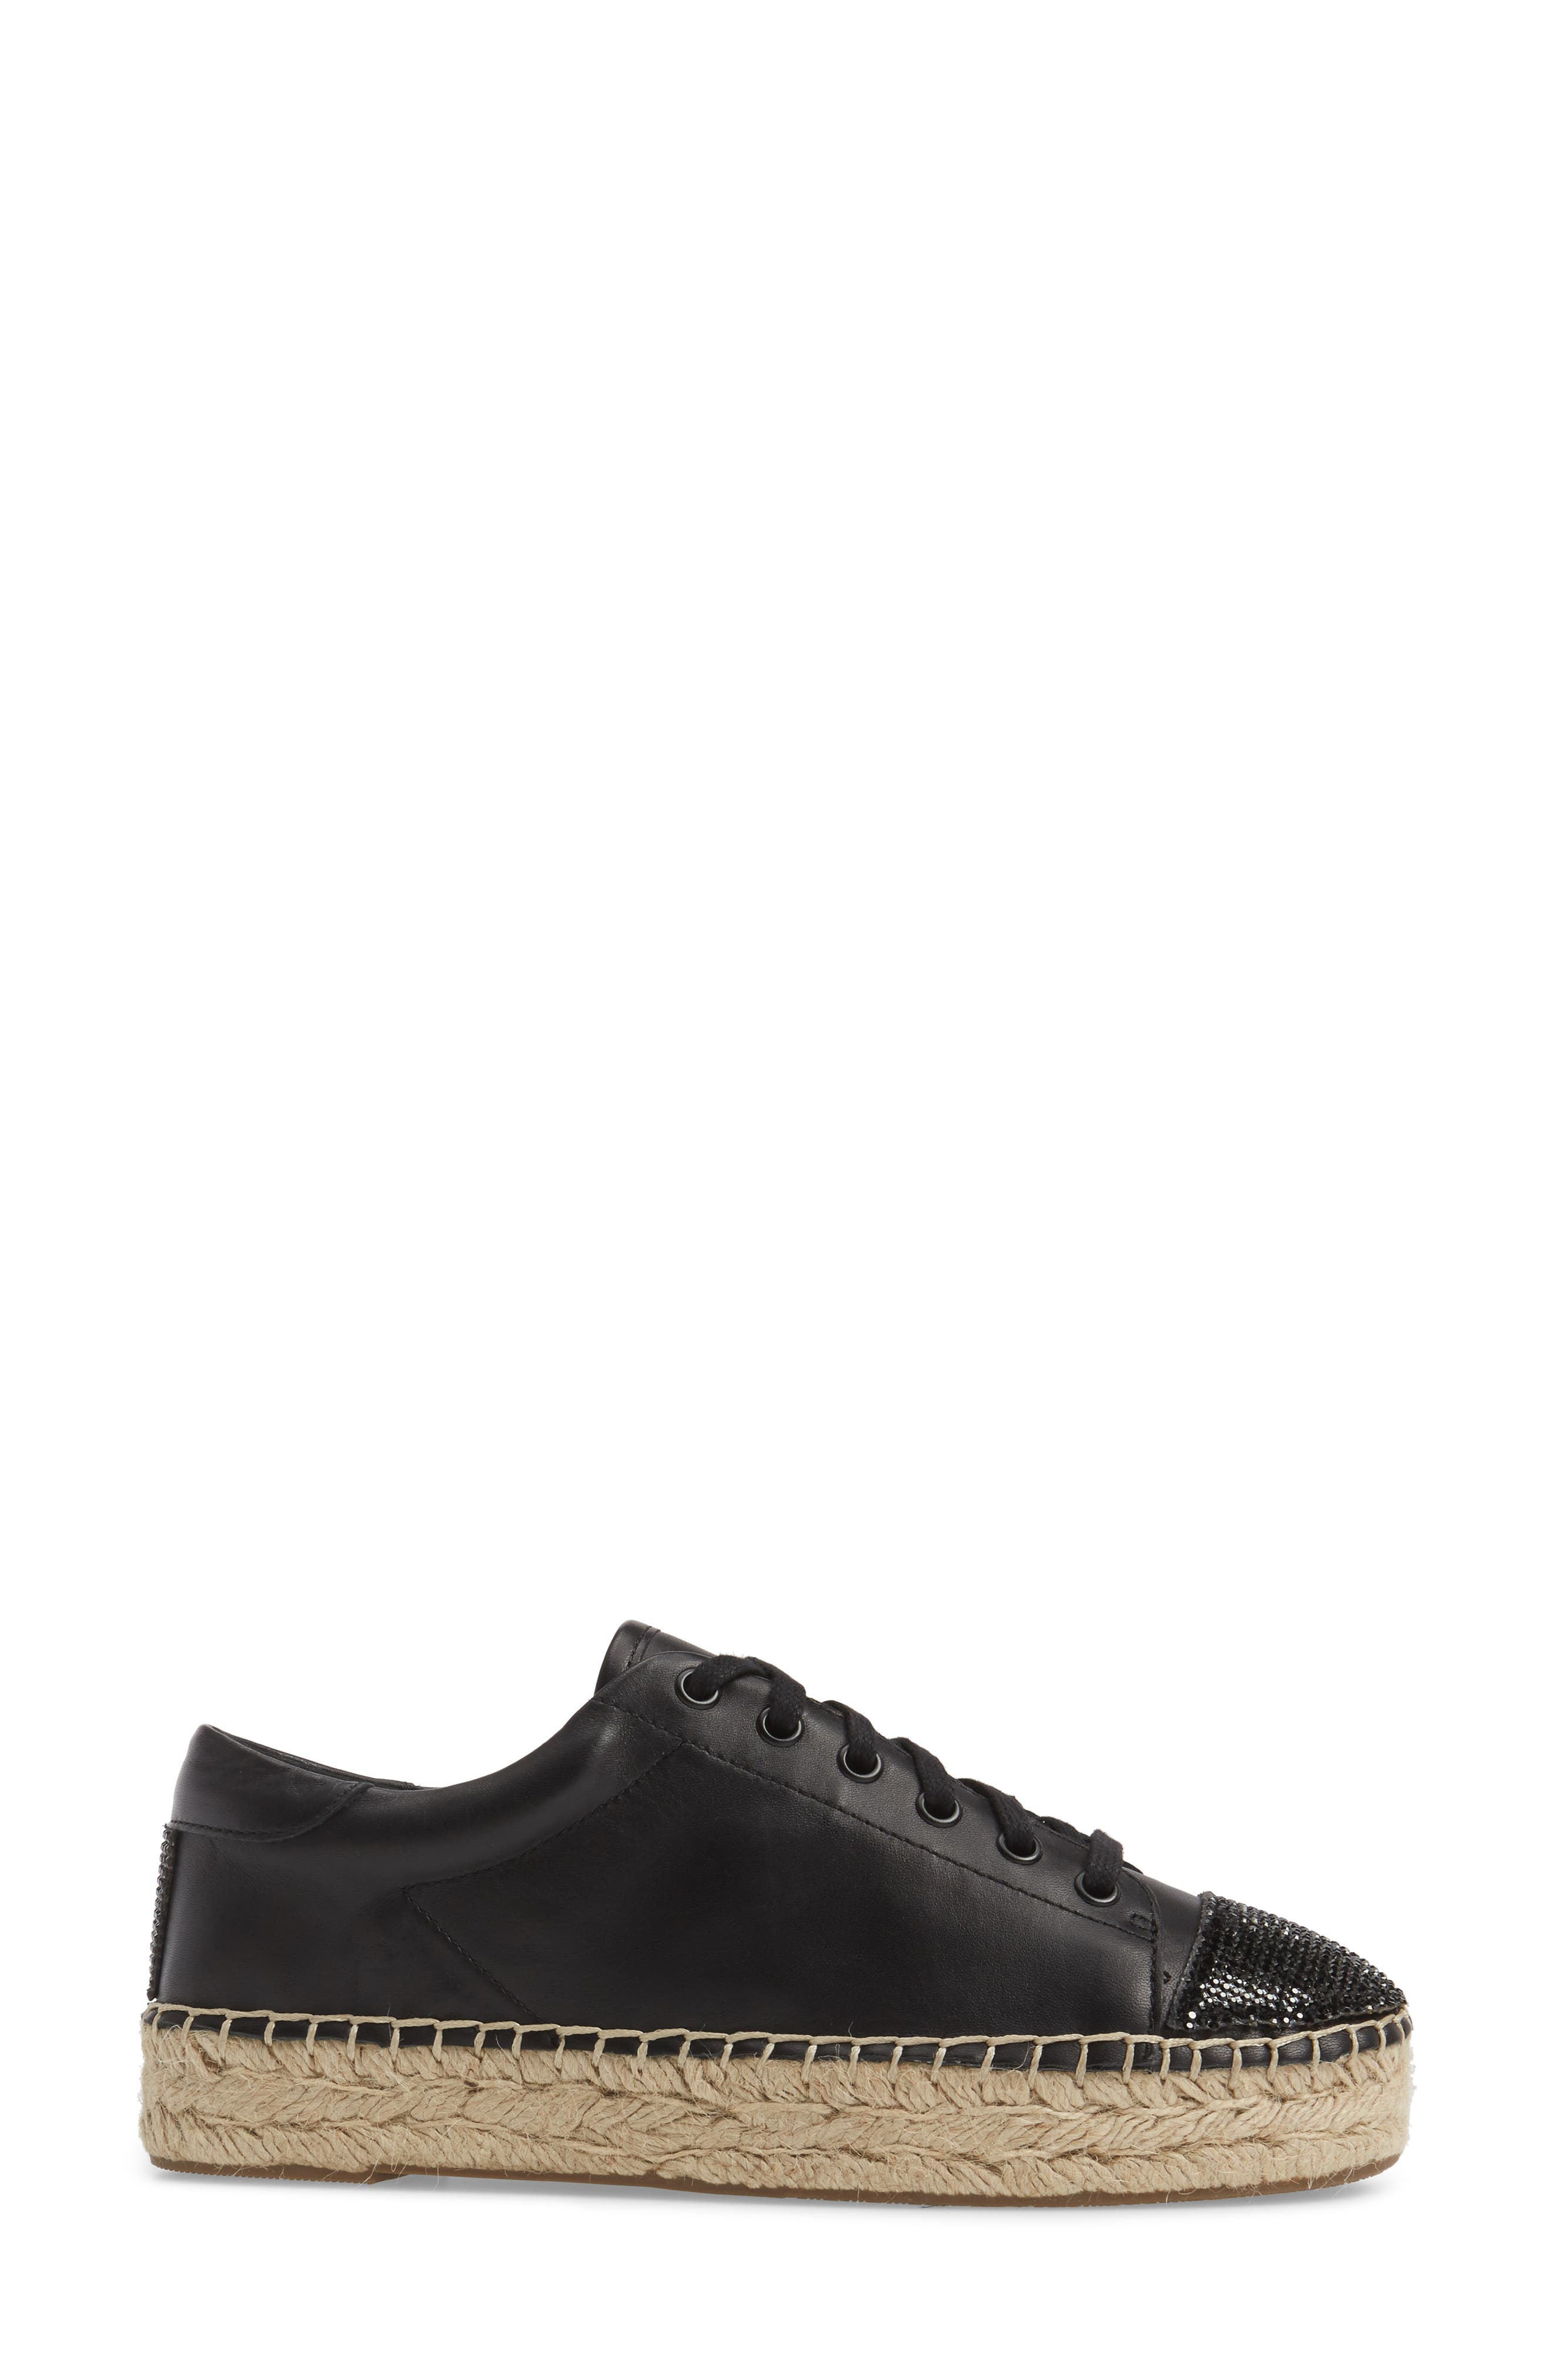 Joslyn Espadrille Sneaker,                             Alternate thumbnail 3, color,                             001